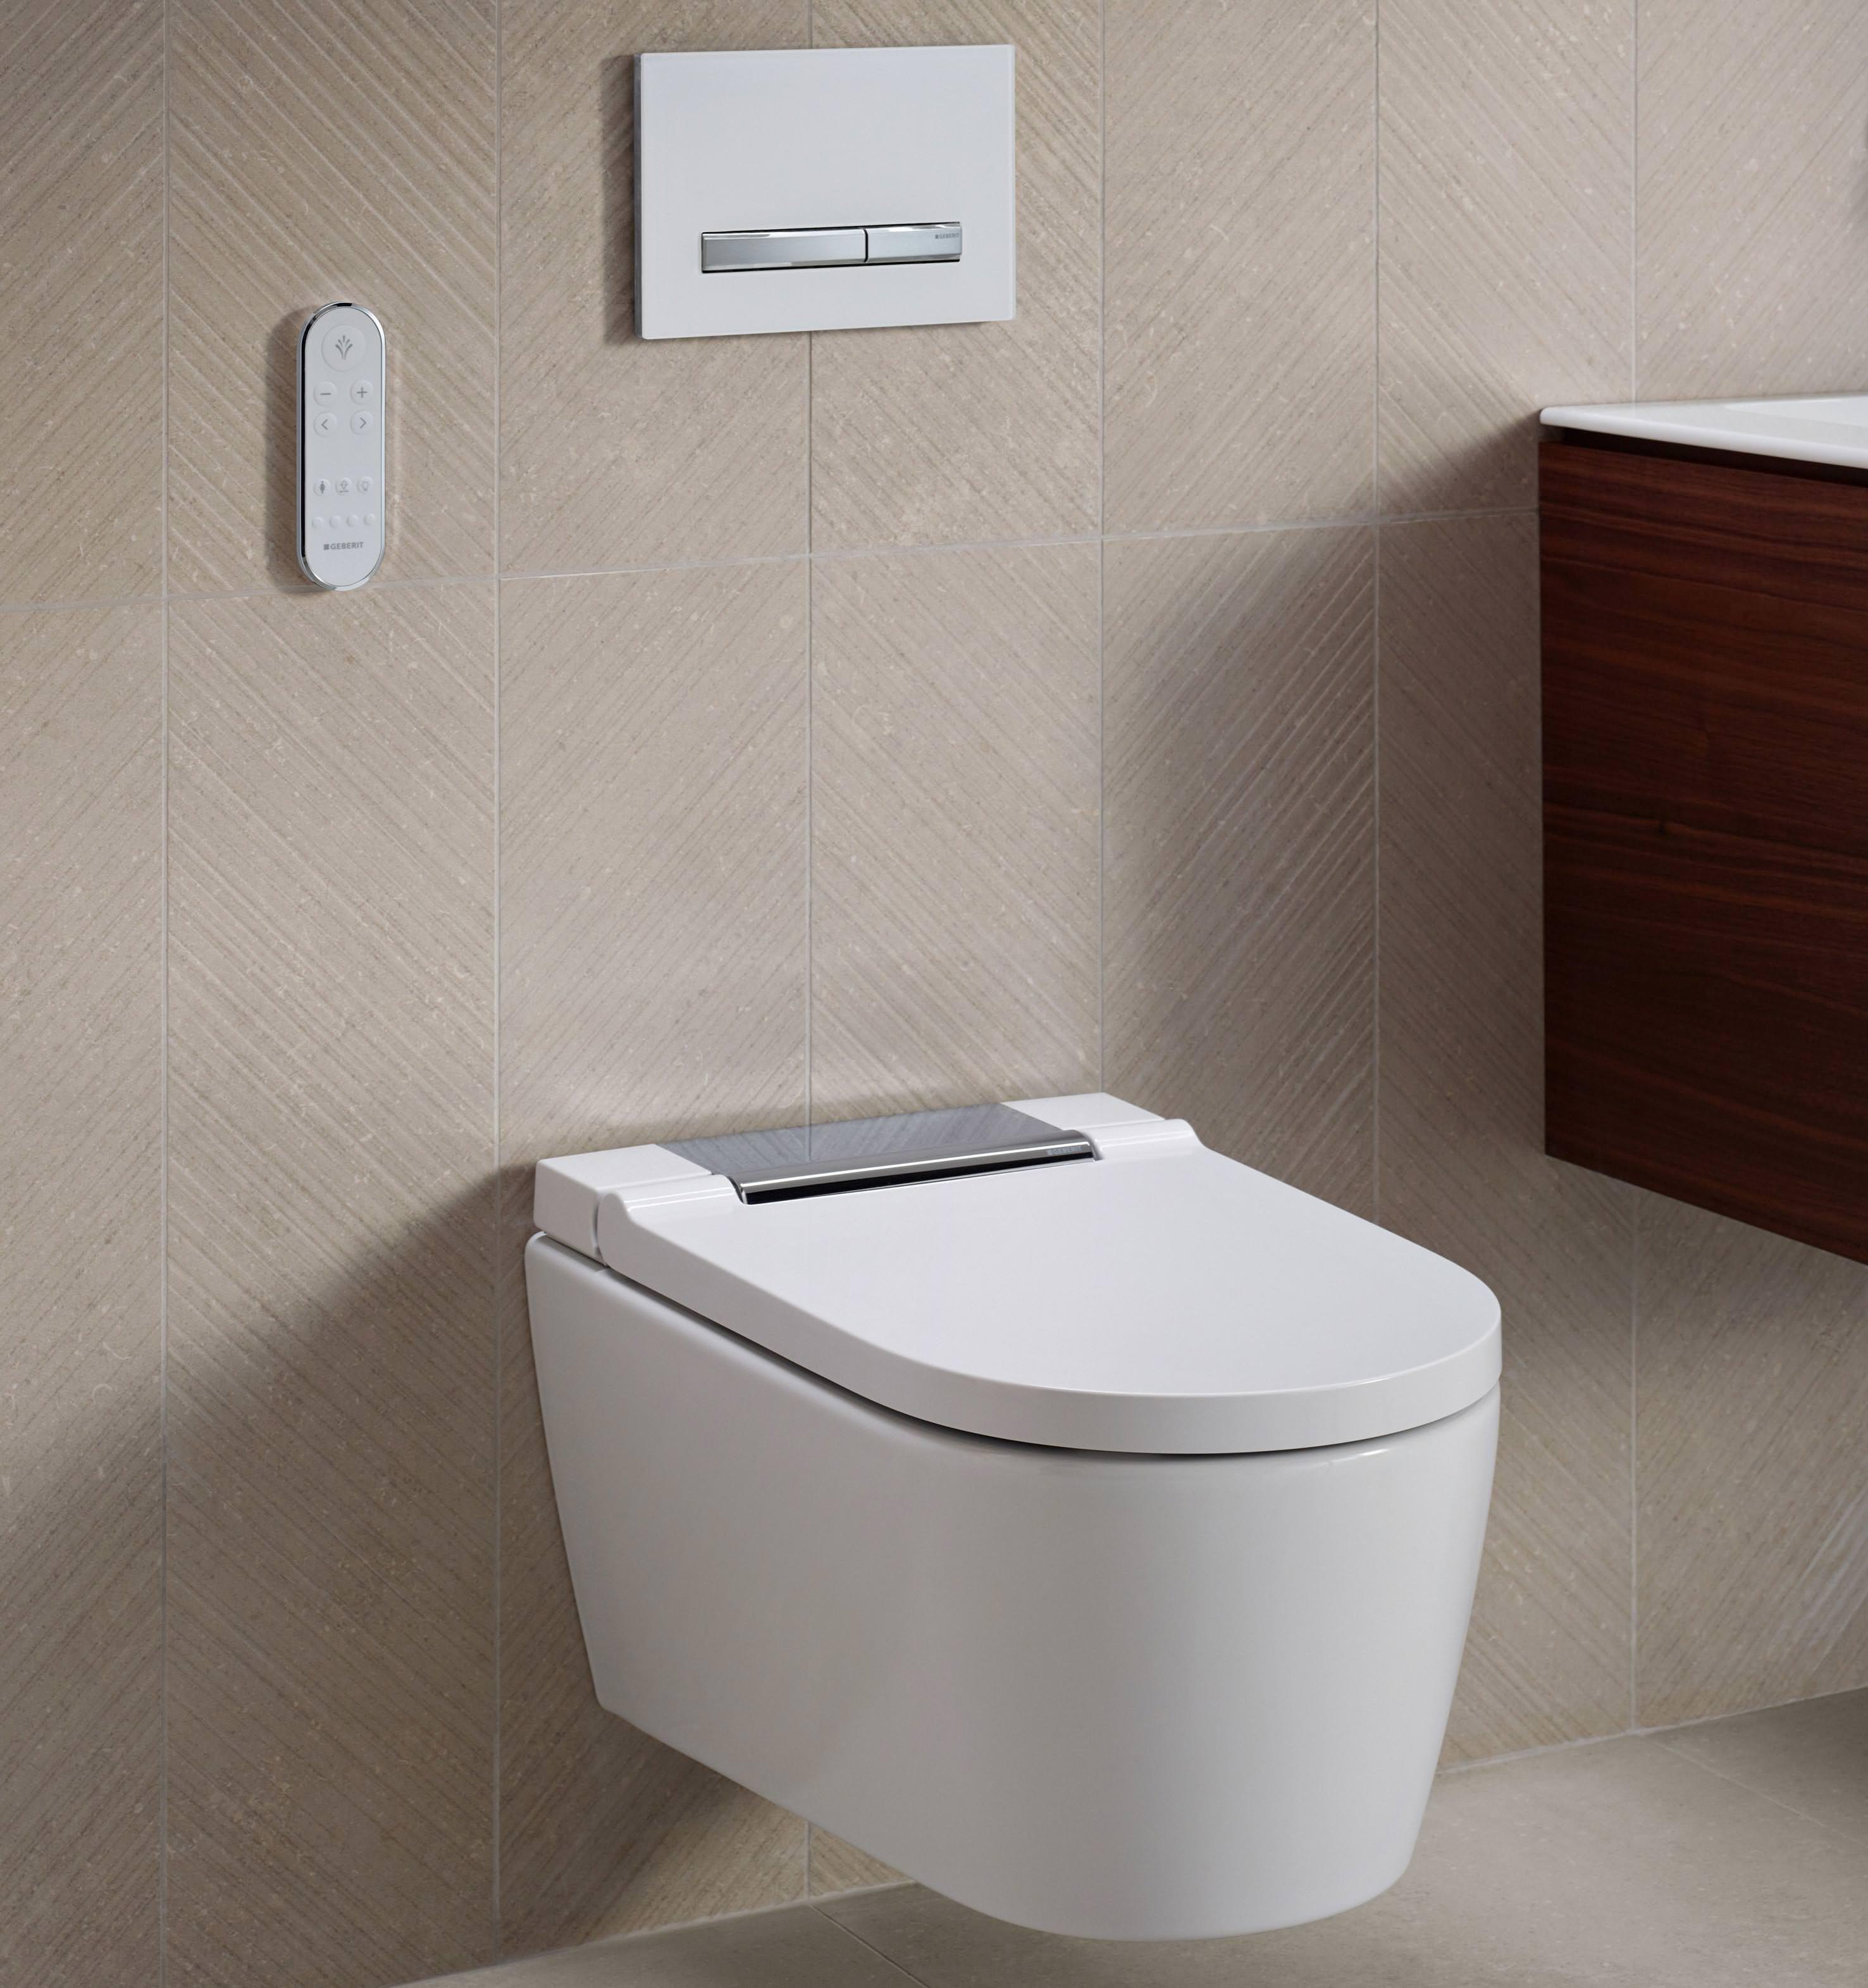 Bekannt AquaClean Sela: Schnörkel- und spülrandloses Dusch-WC mit Lady NK06